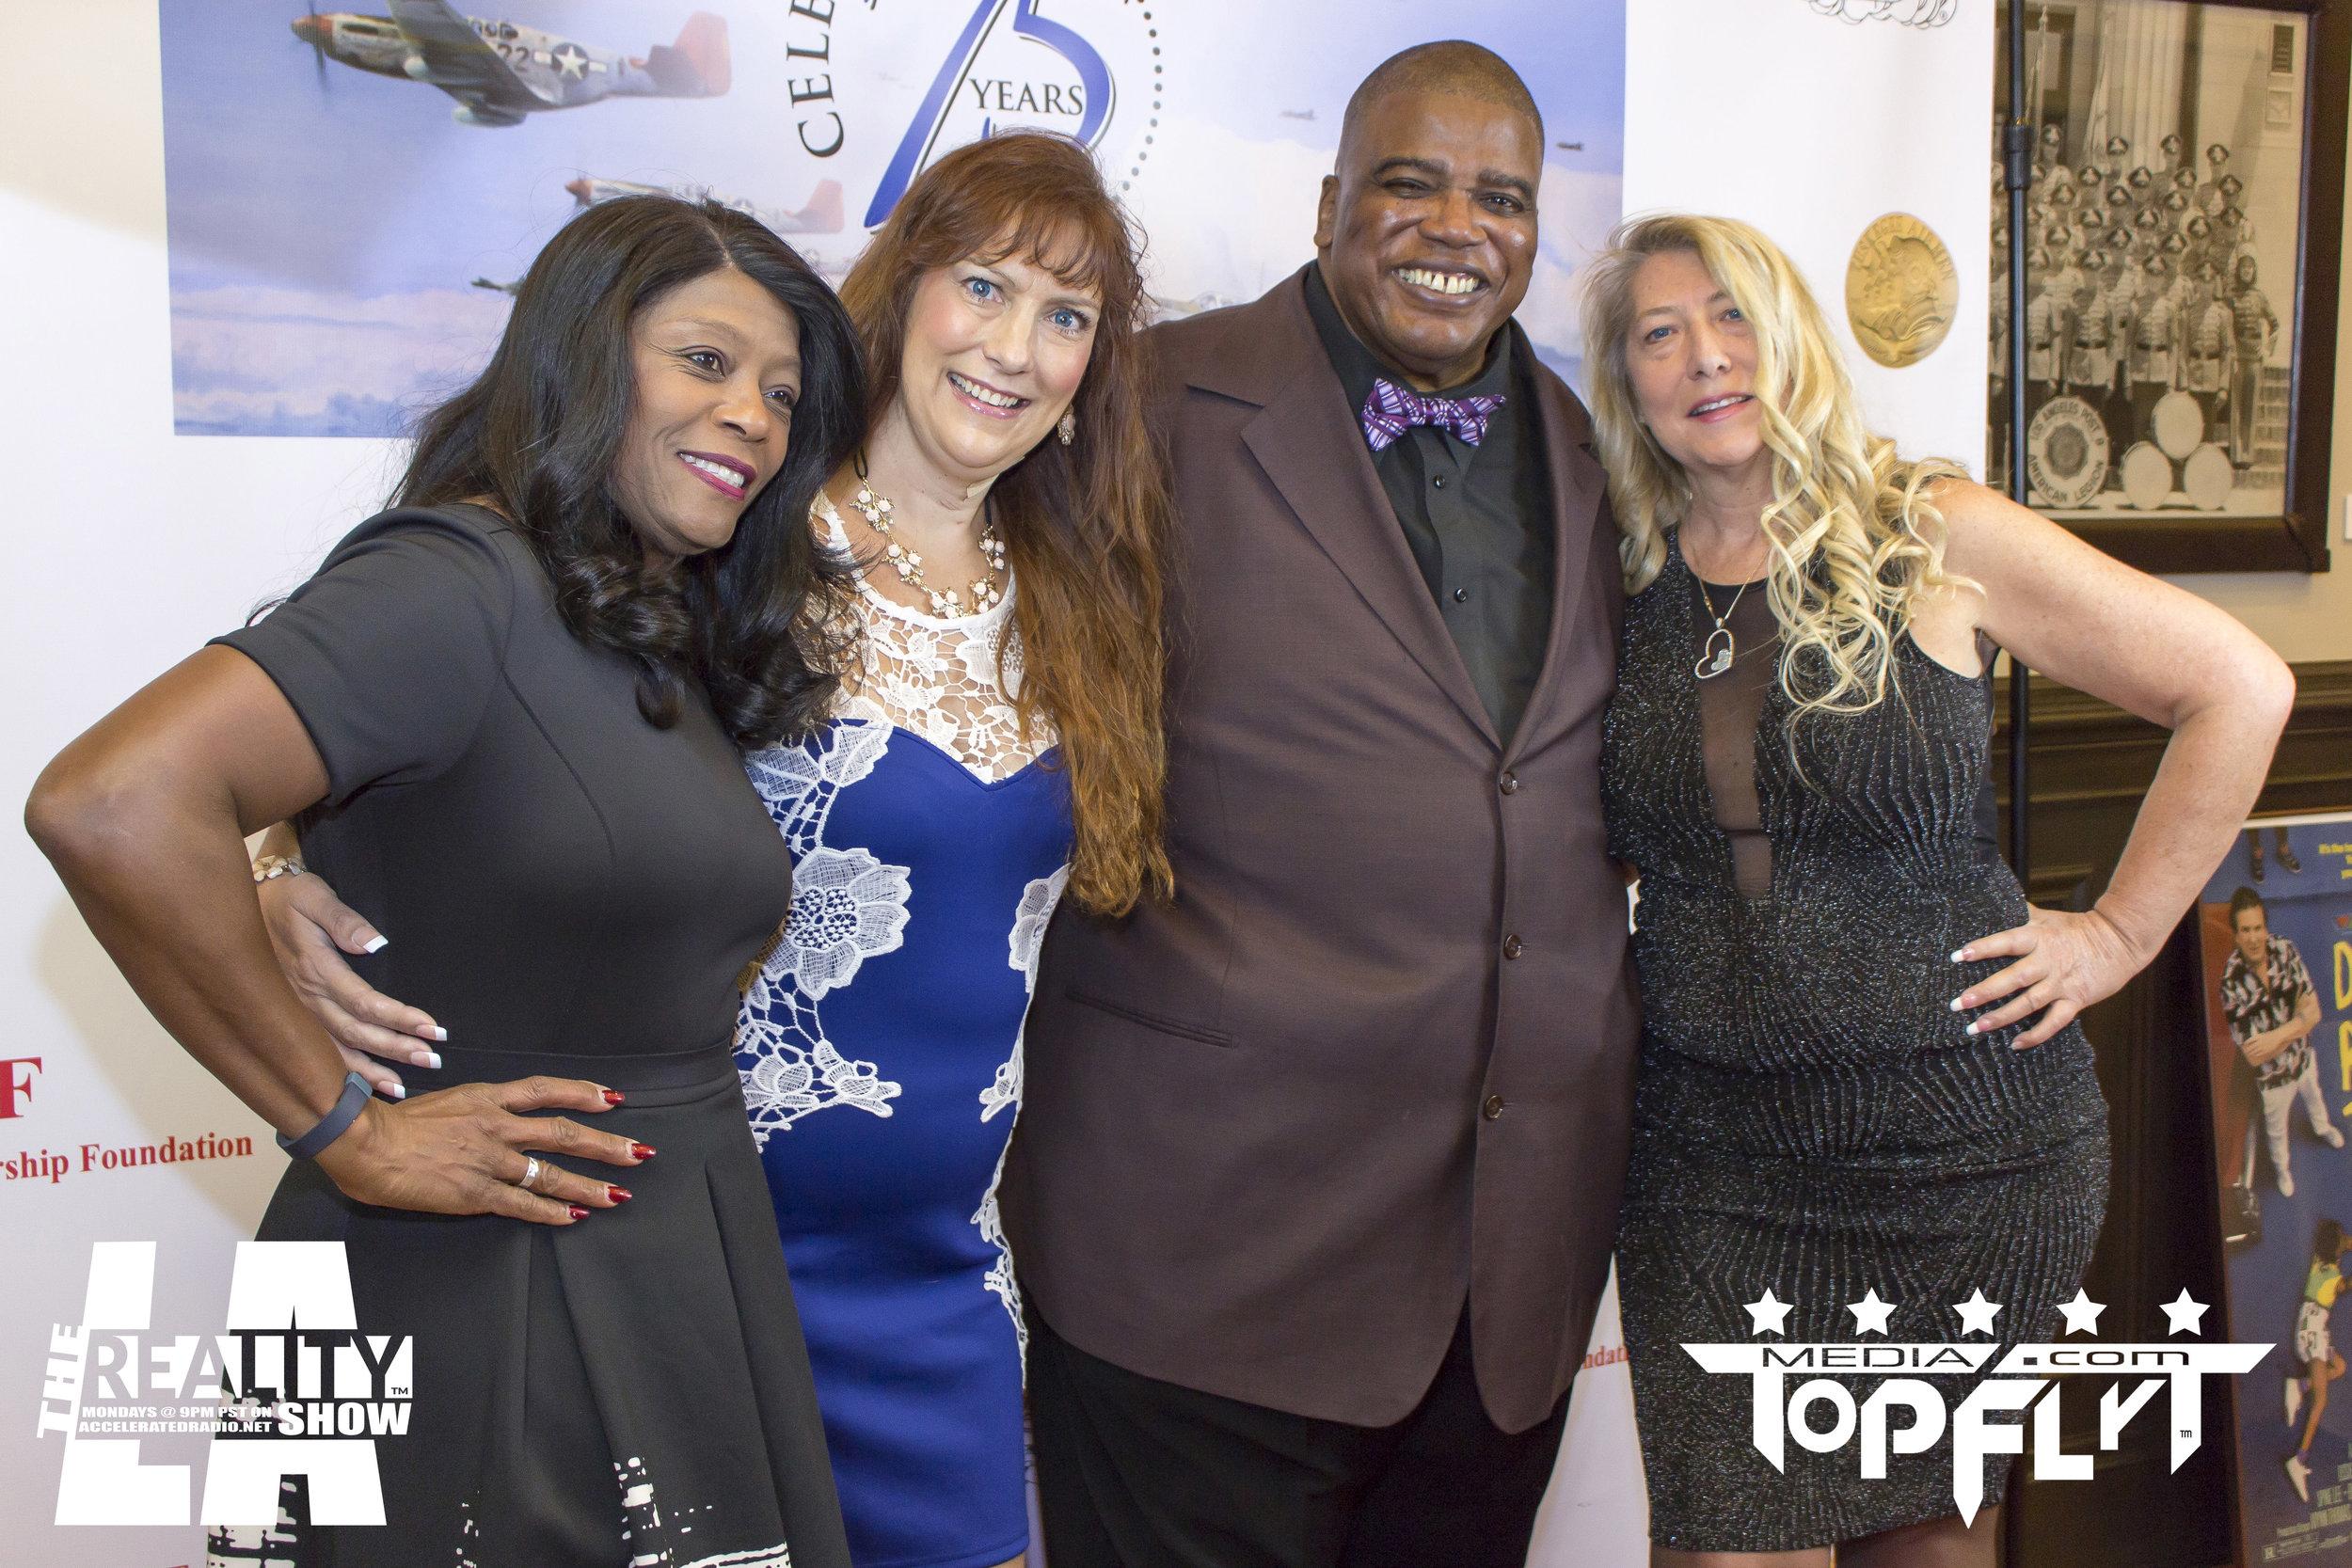 The Reality Show LA - Tuskegee Airmen 75th Anniversary VIP Reception_44.jpg